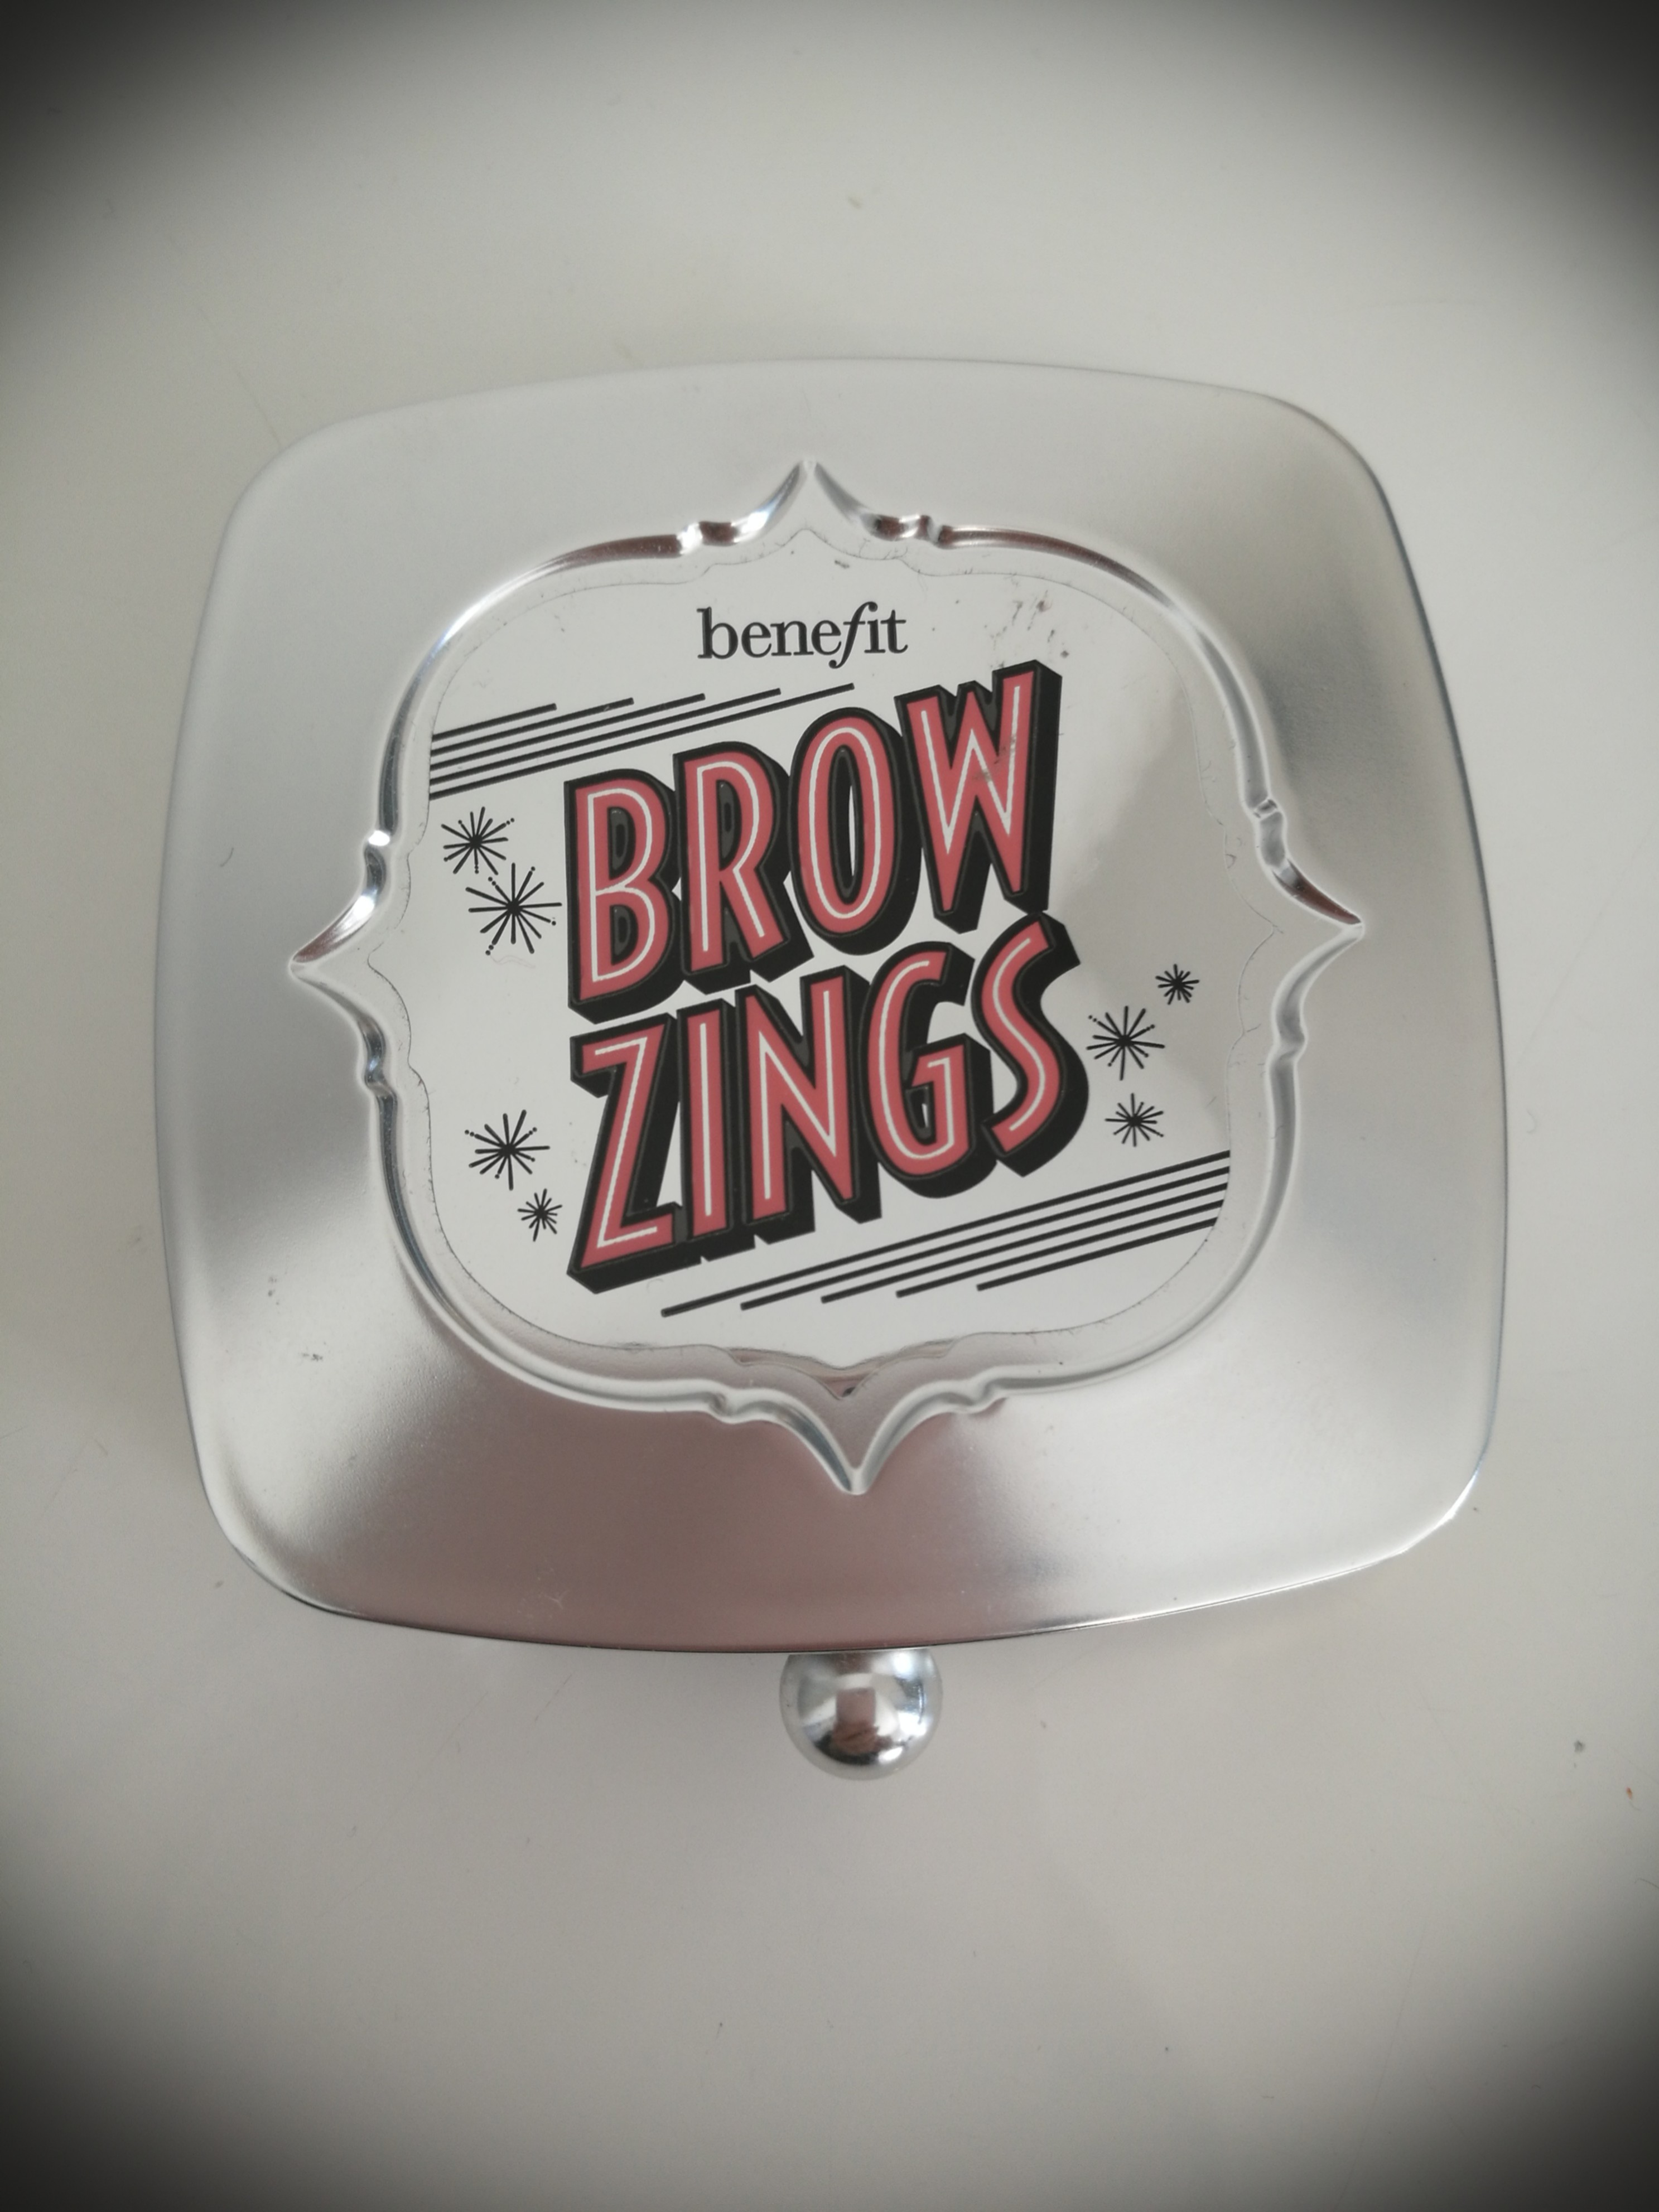 BENEFIT brow zings eyebrow shaping kit * FREE brand new lipstick*